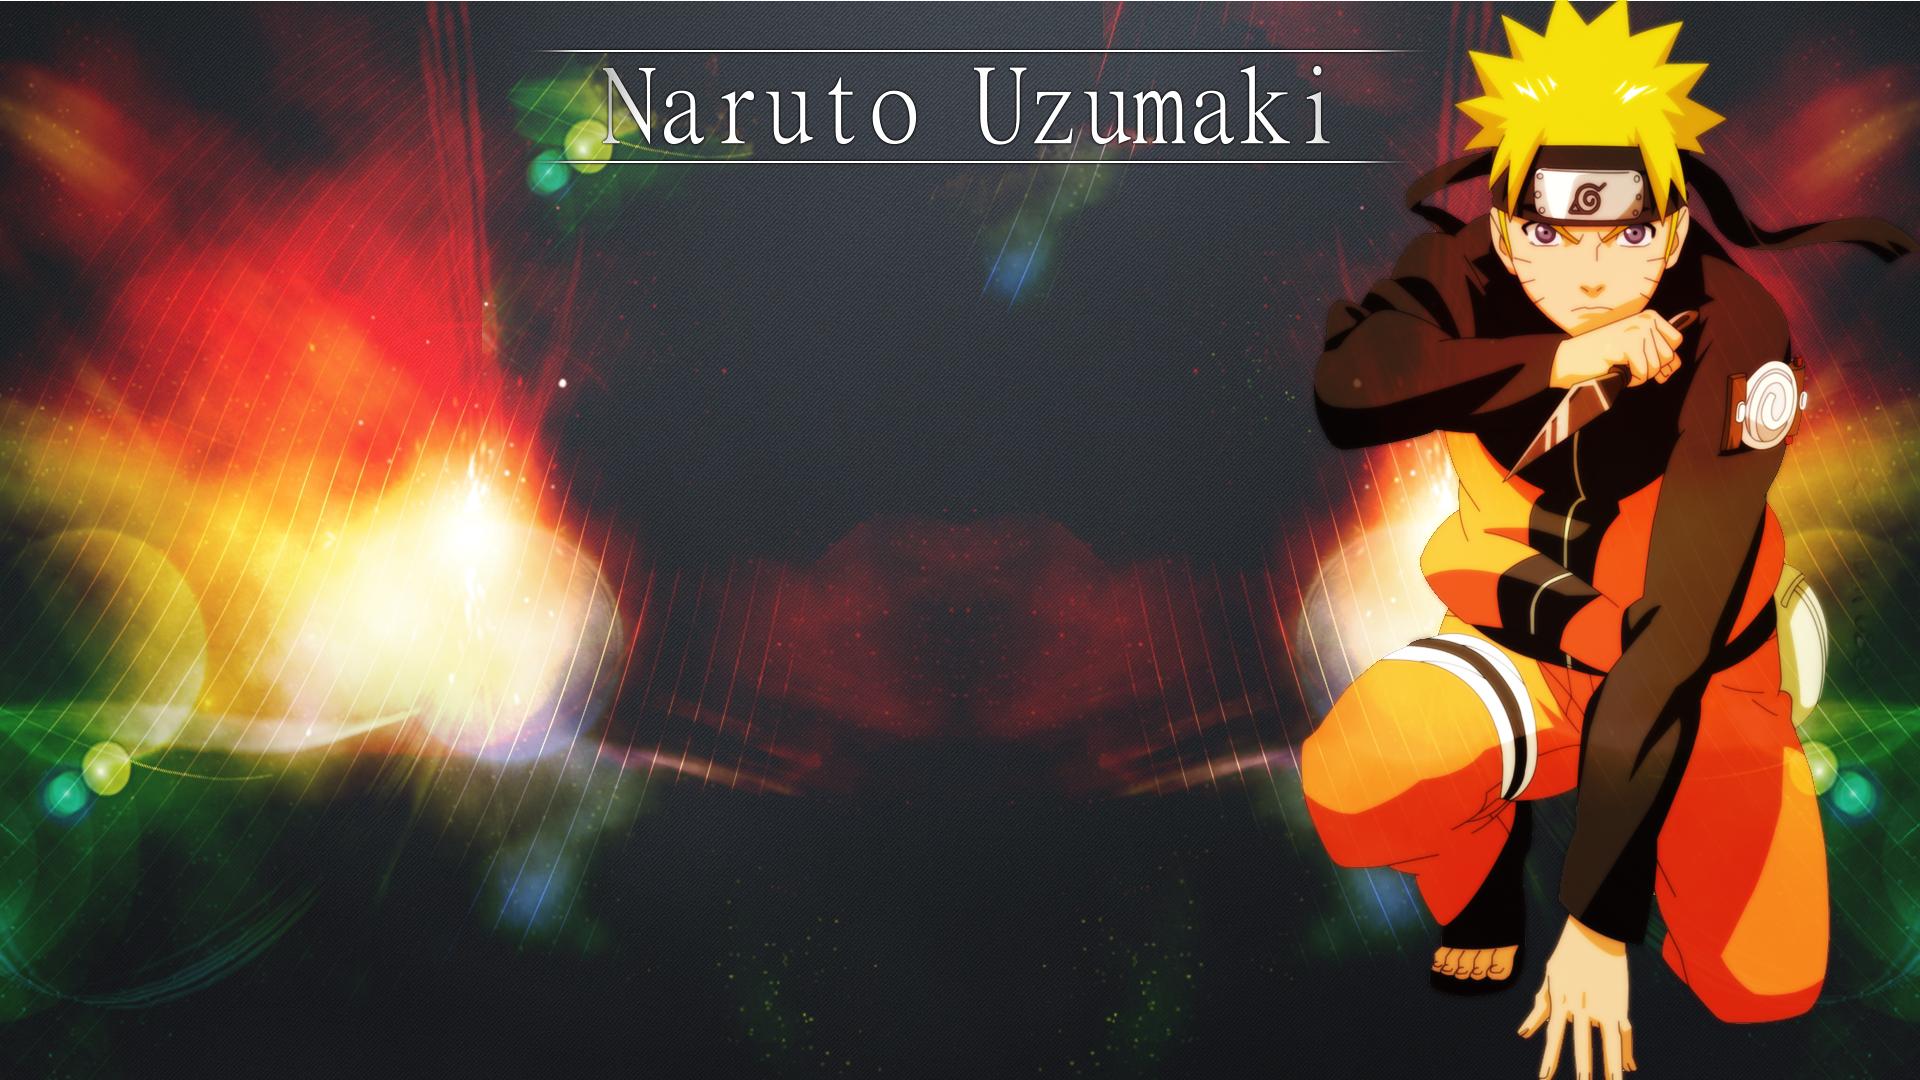 Popular Wallpaper Naruto Deviantart - naruto_uzumaki_1920x1080_wallpaper_by_xsorakurosaki-d6j7z8z  HD_808097.png